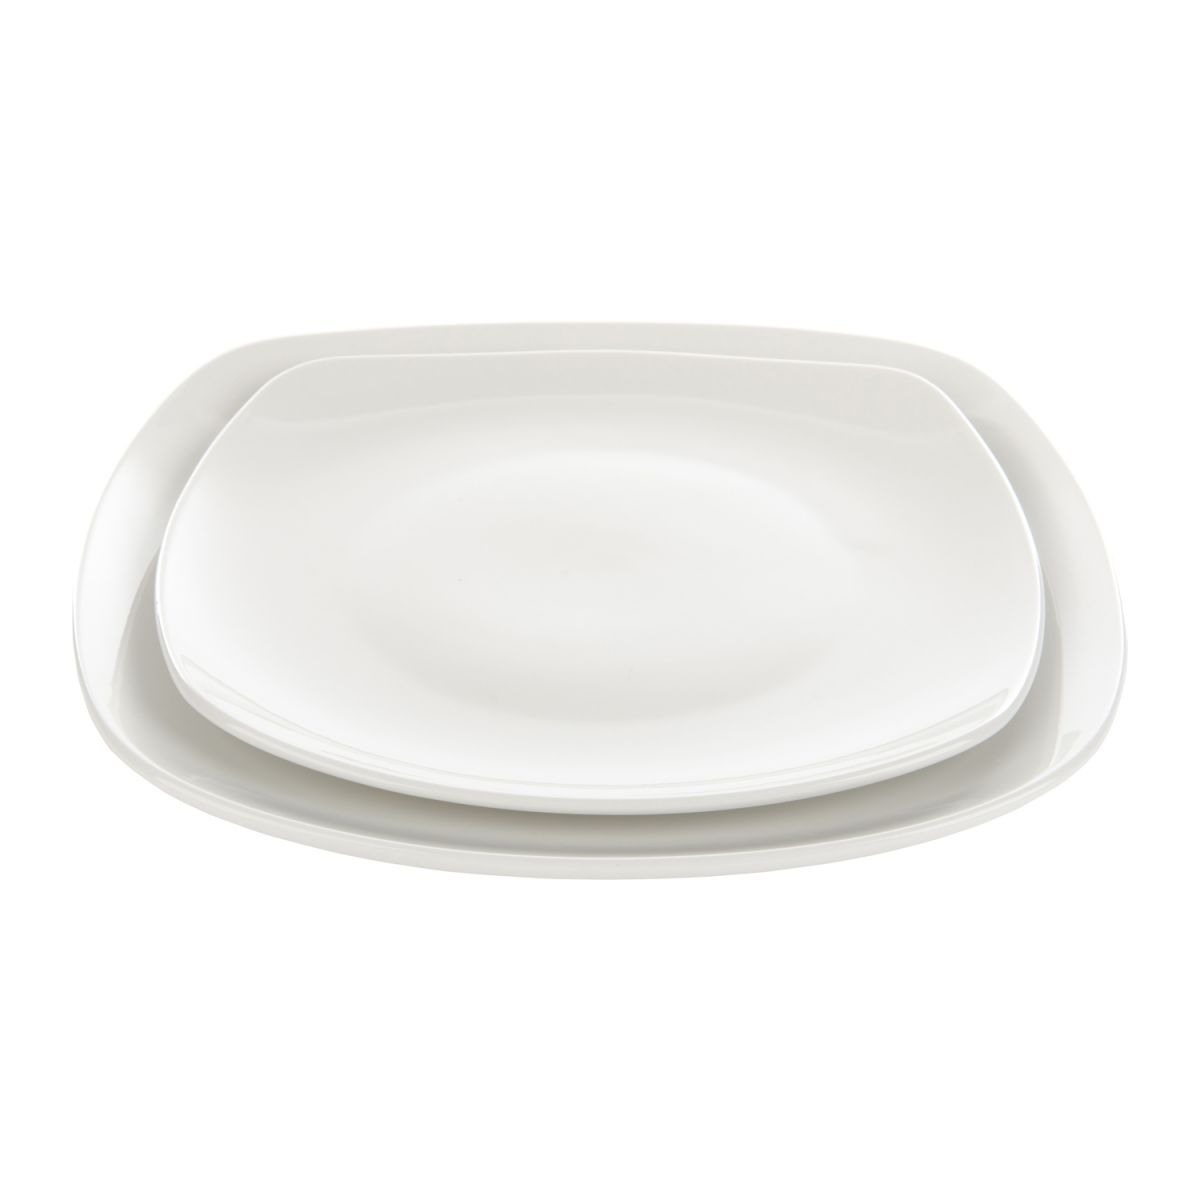 plate dinner 29x29x25cm box4